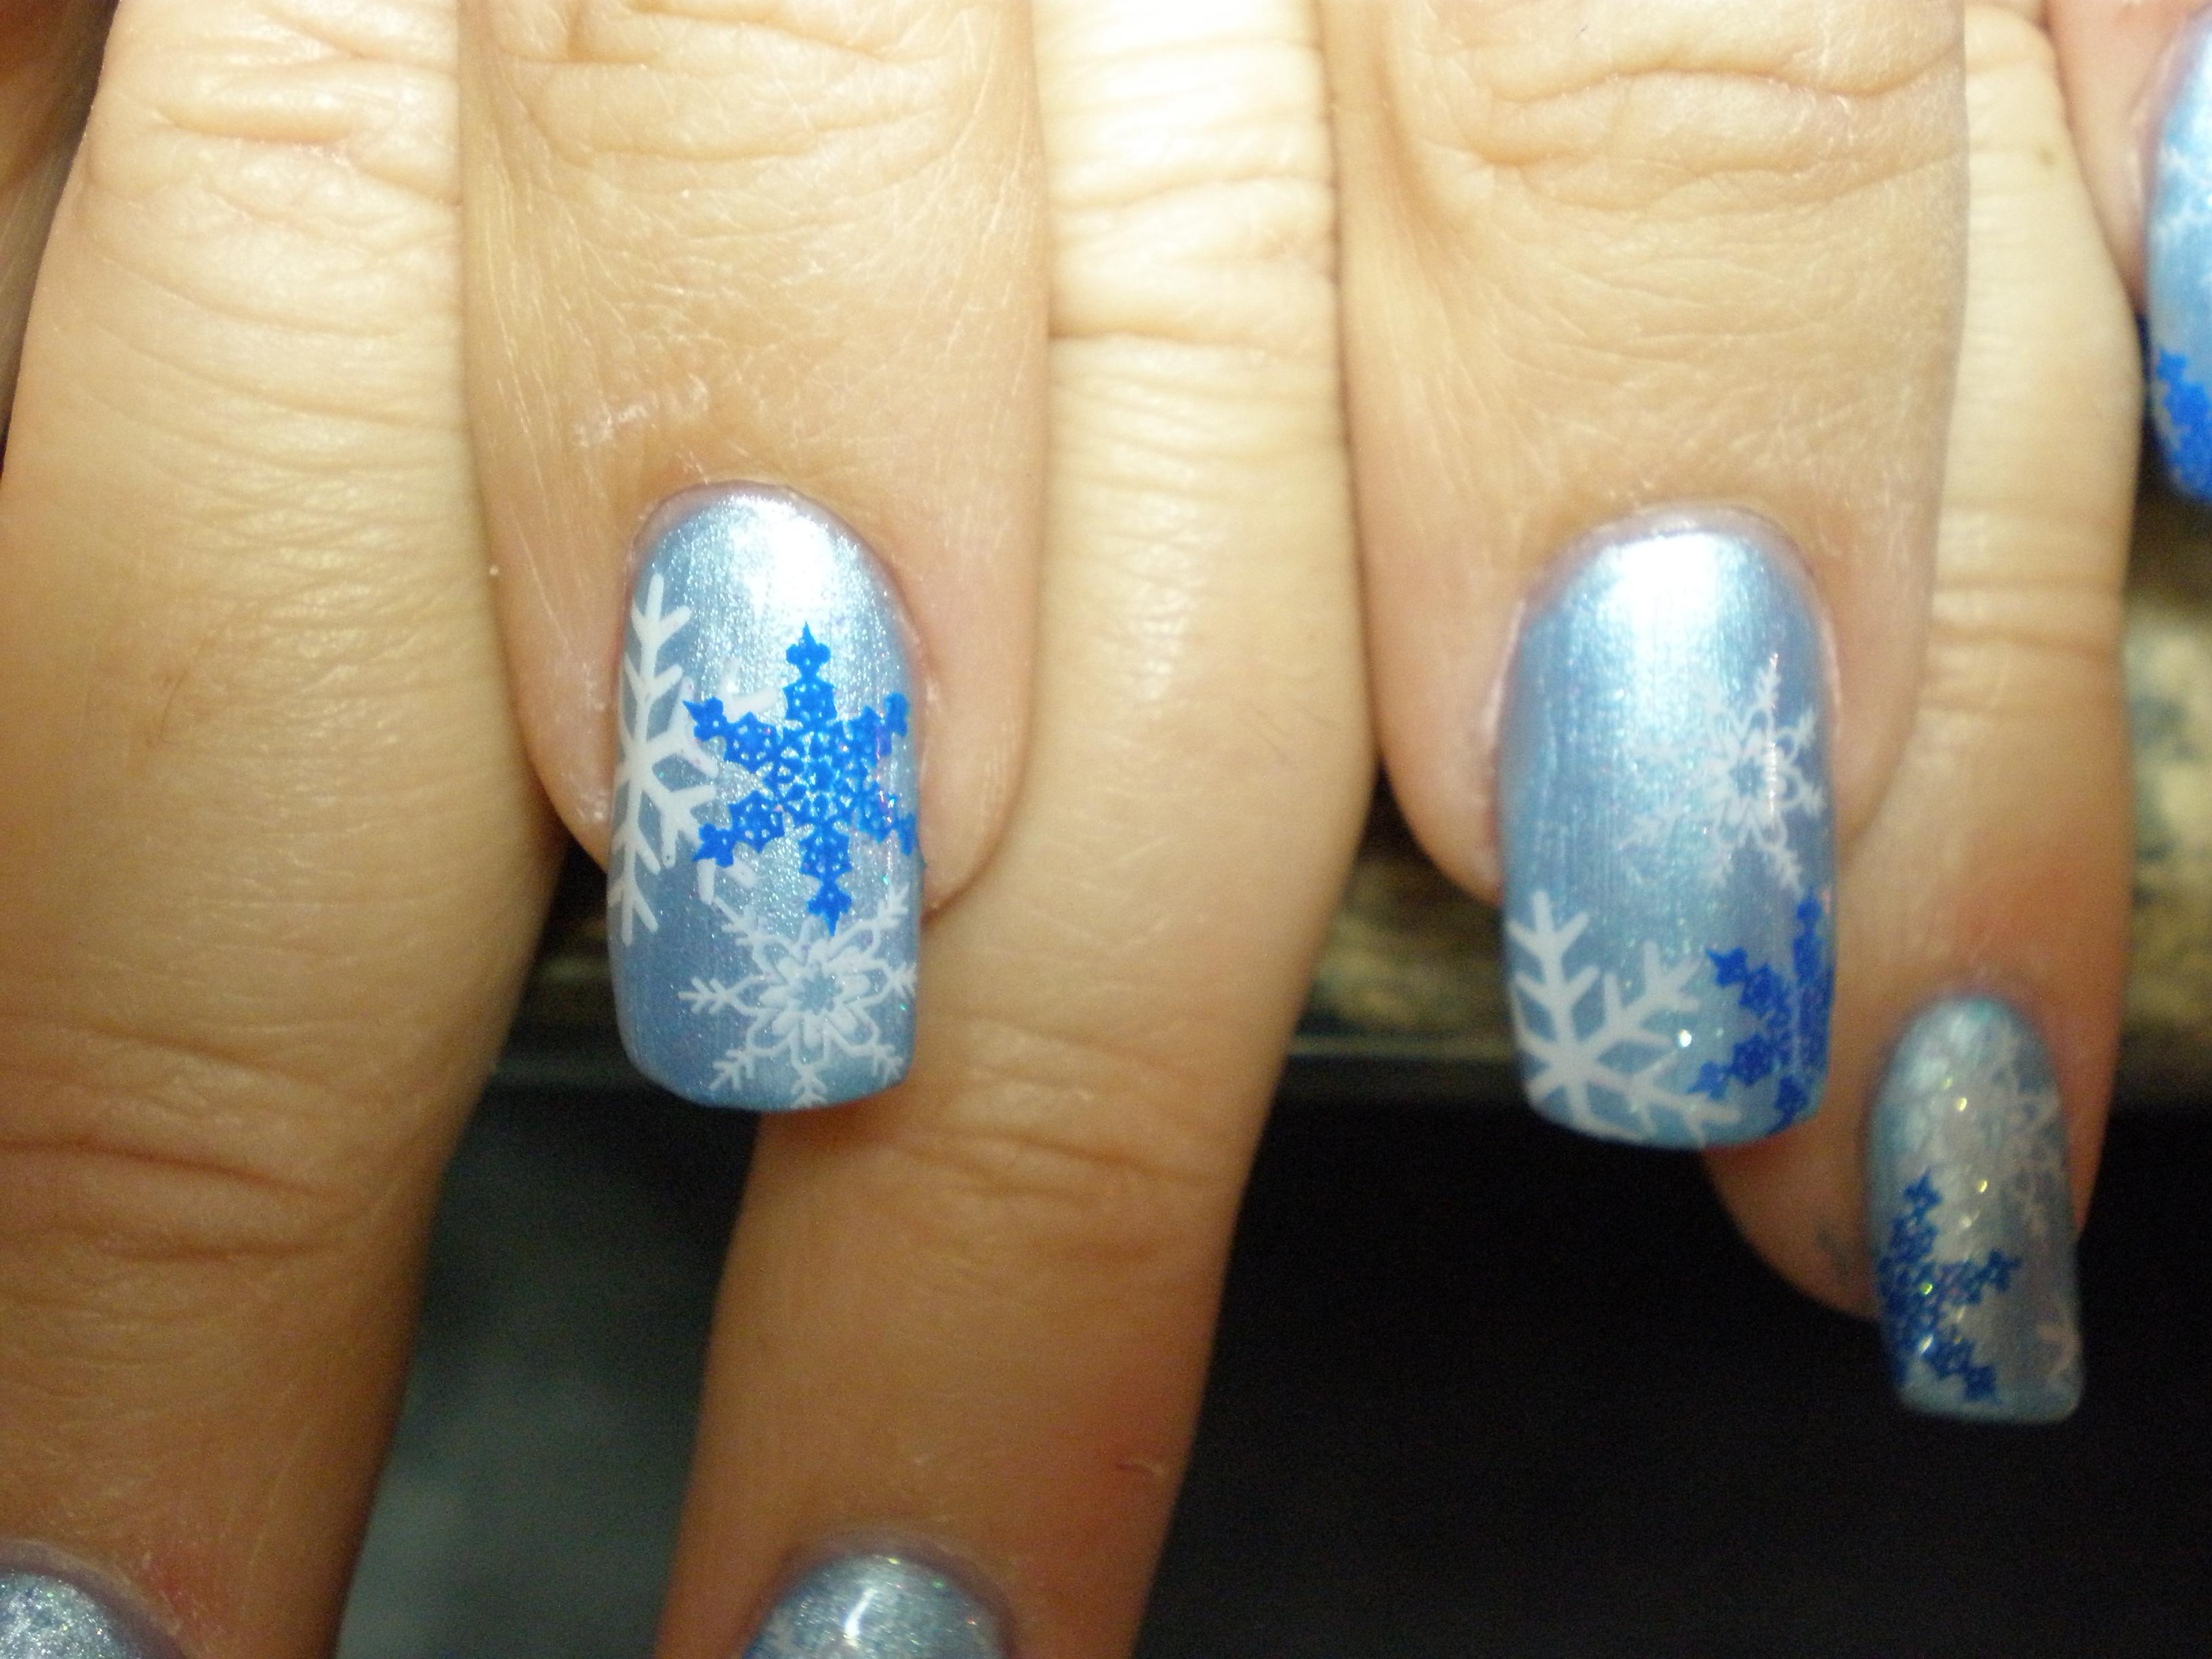 schnee winter nailart stamping weihnachten planet nails pimp nails. Black Bedroom Furniture Sets. Home Design Ideas